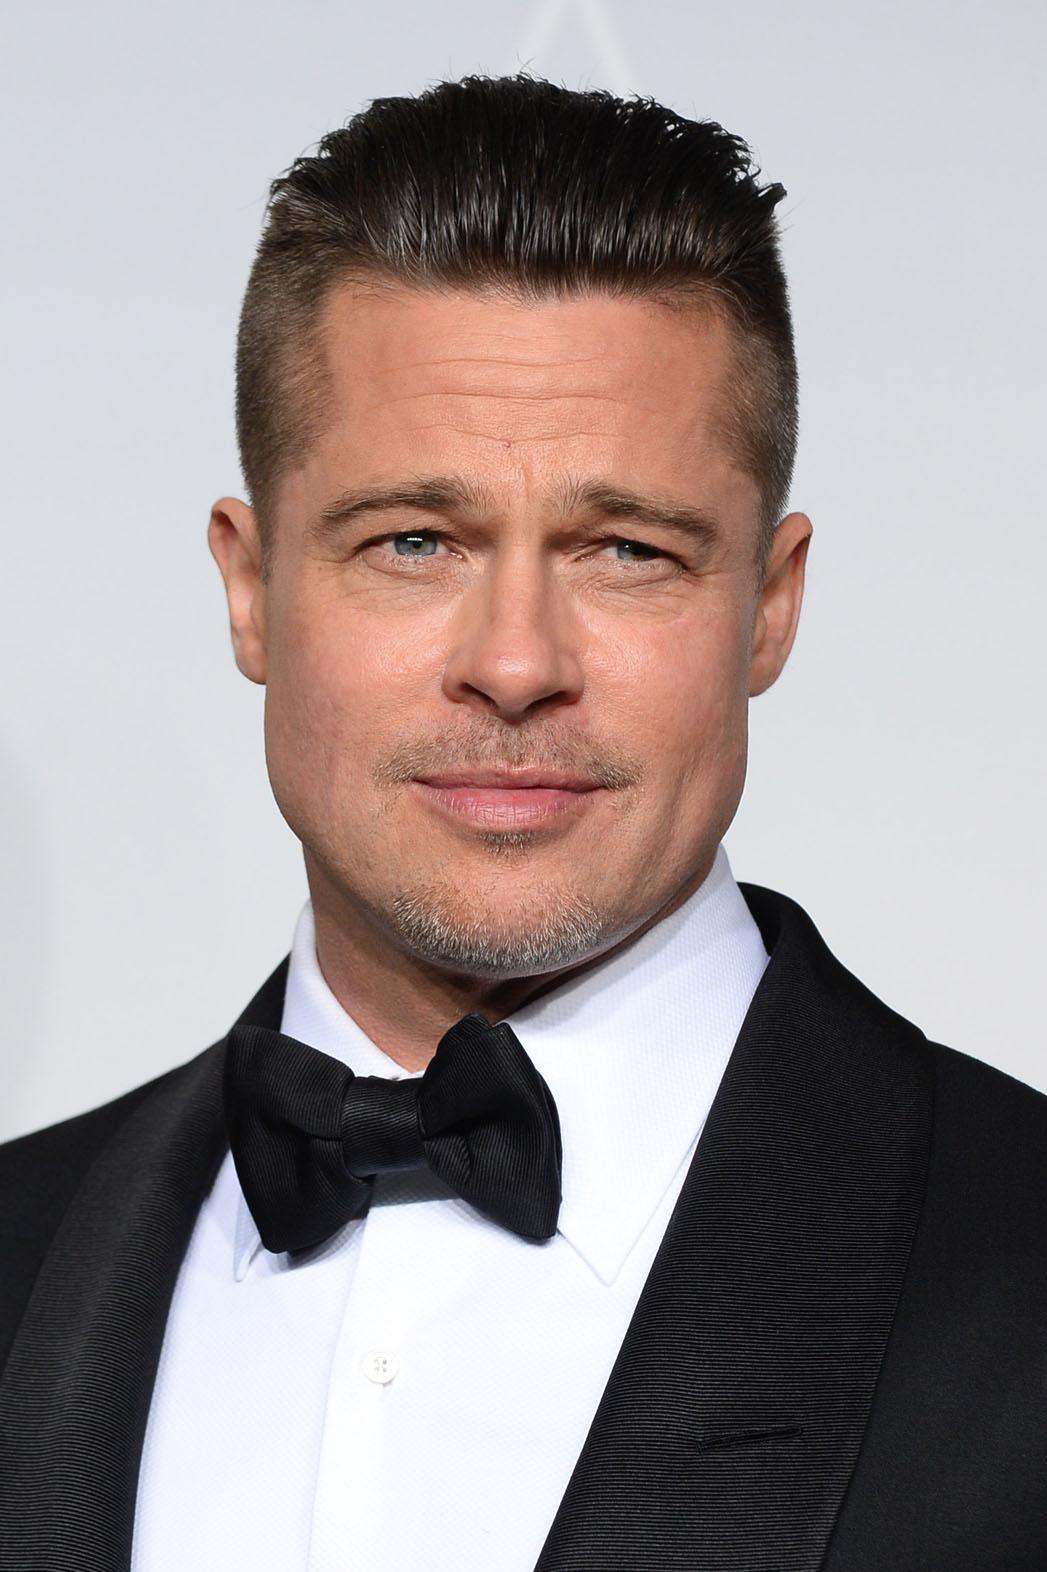 Brad Pitt Oscars Headshot - P 2014